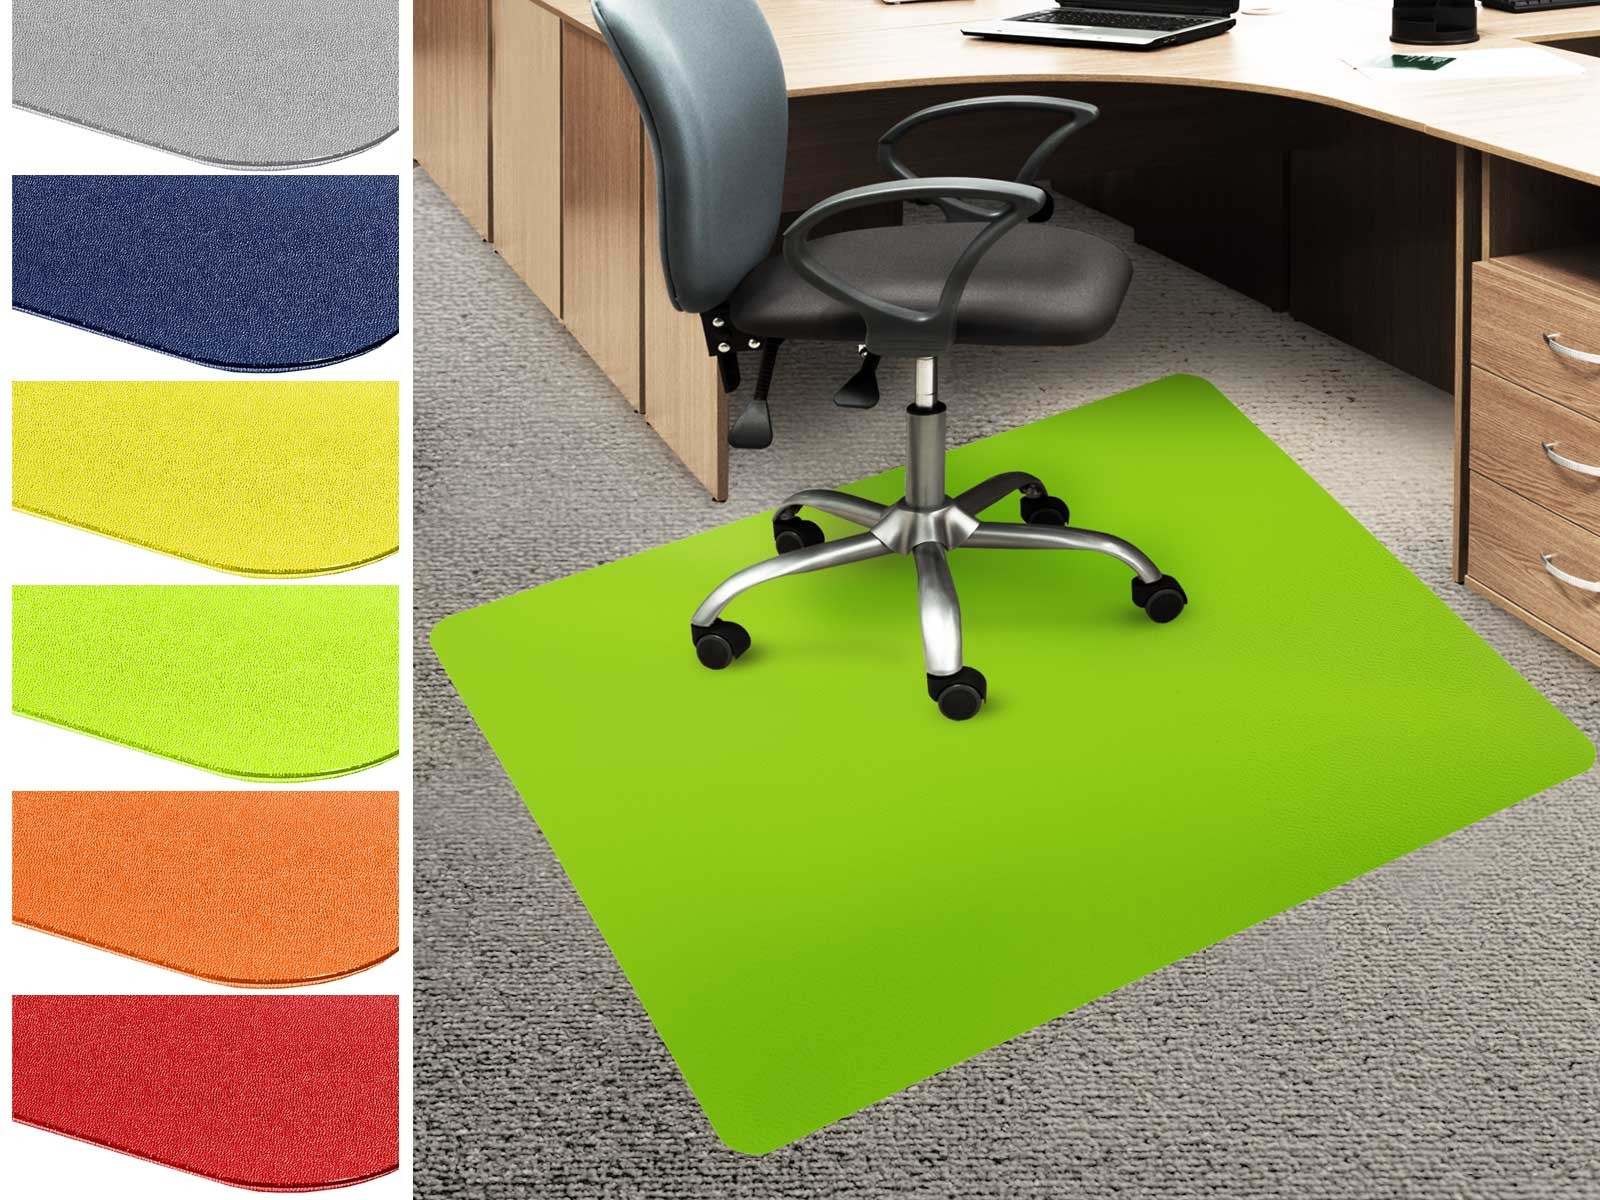 bodenschutzmatte economy f r teppichb den farbig. Black Bedroom Furniture Sets. Home Design Ideas